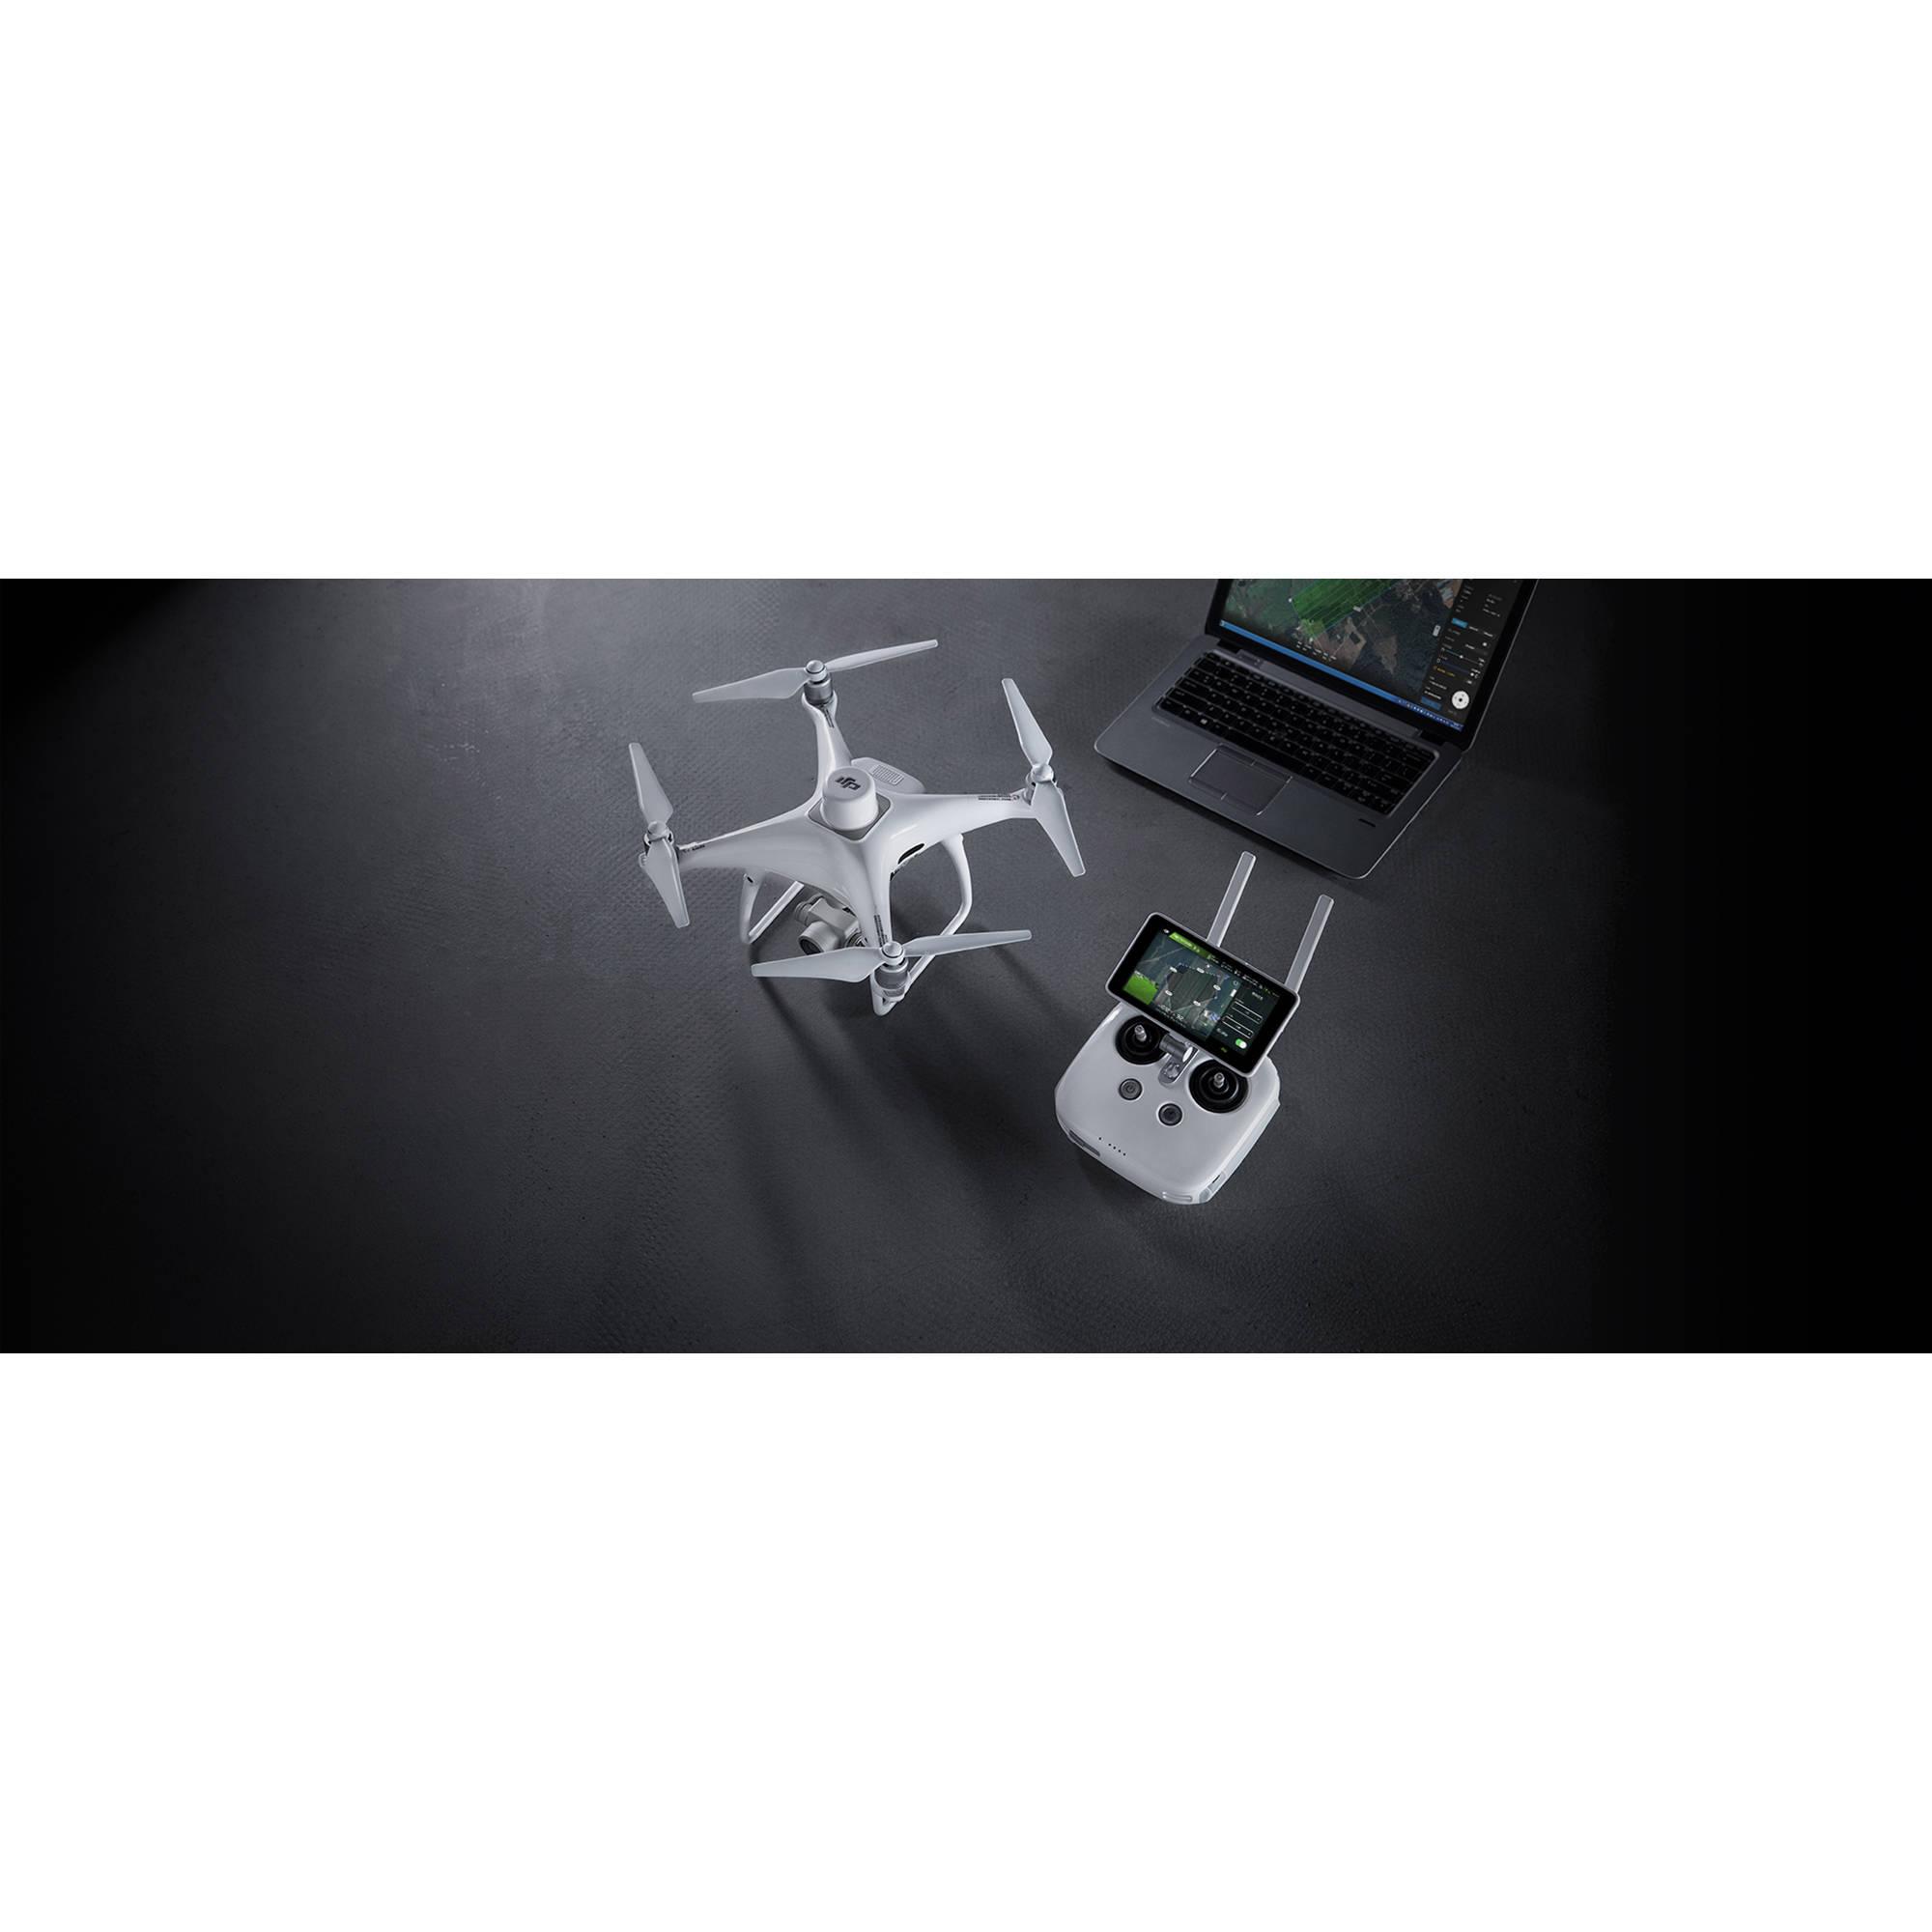 DJI Phantom 4 RTK Quadcopter with D-RTK 2 GNSS CP TP 00000231 01